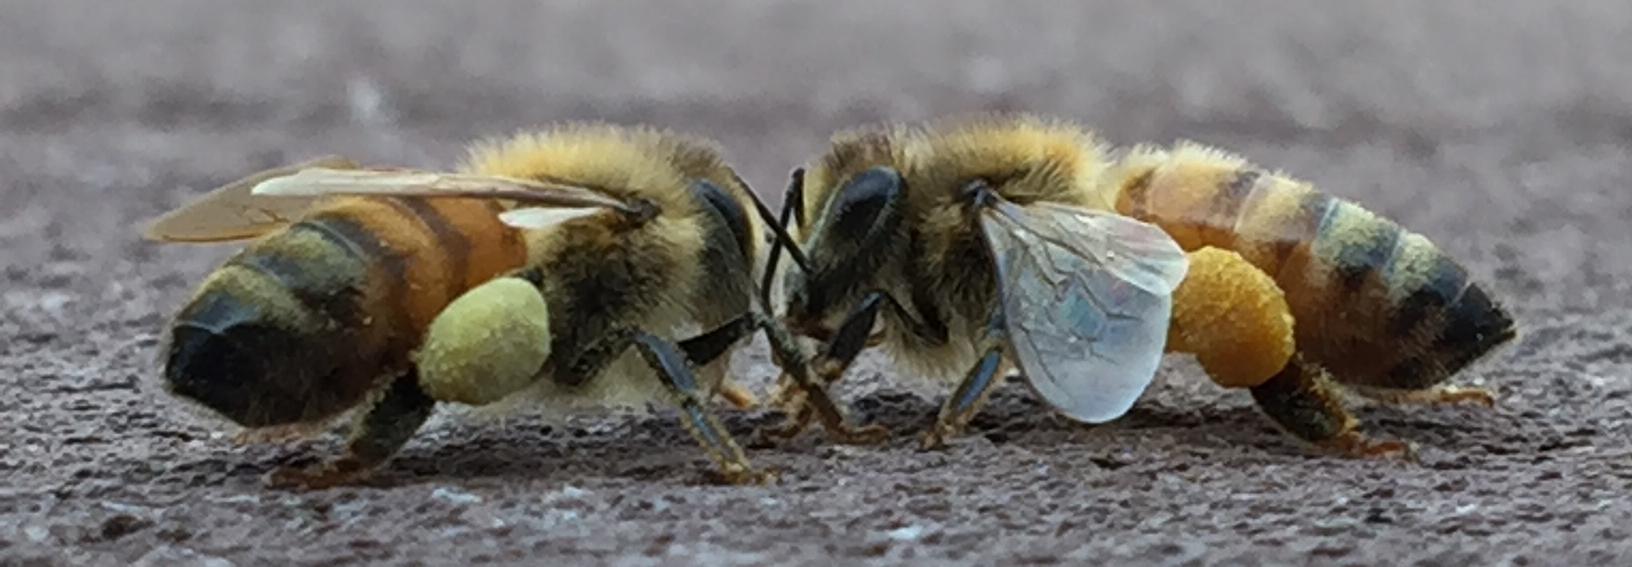 Milwaukee Waukesha Beekeepers Association